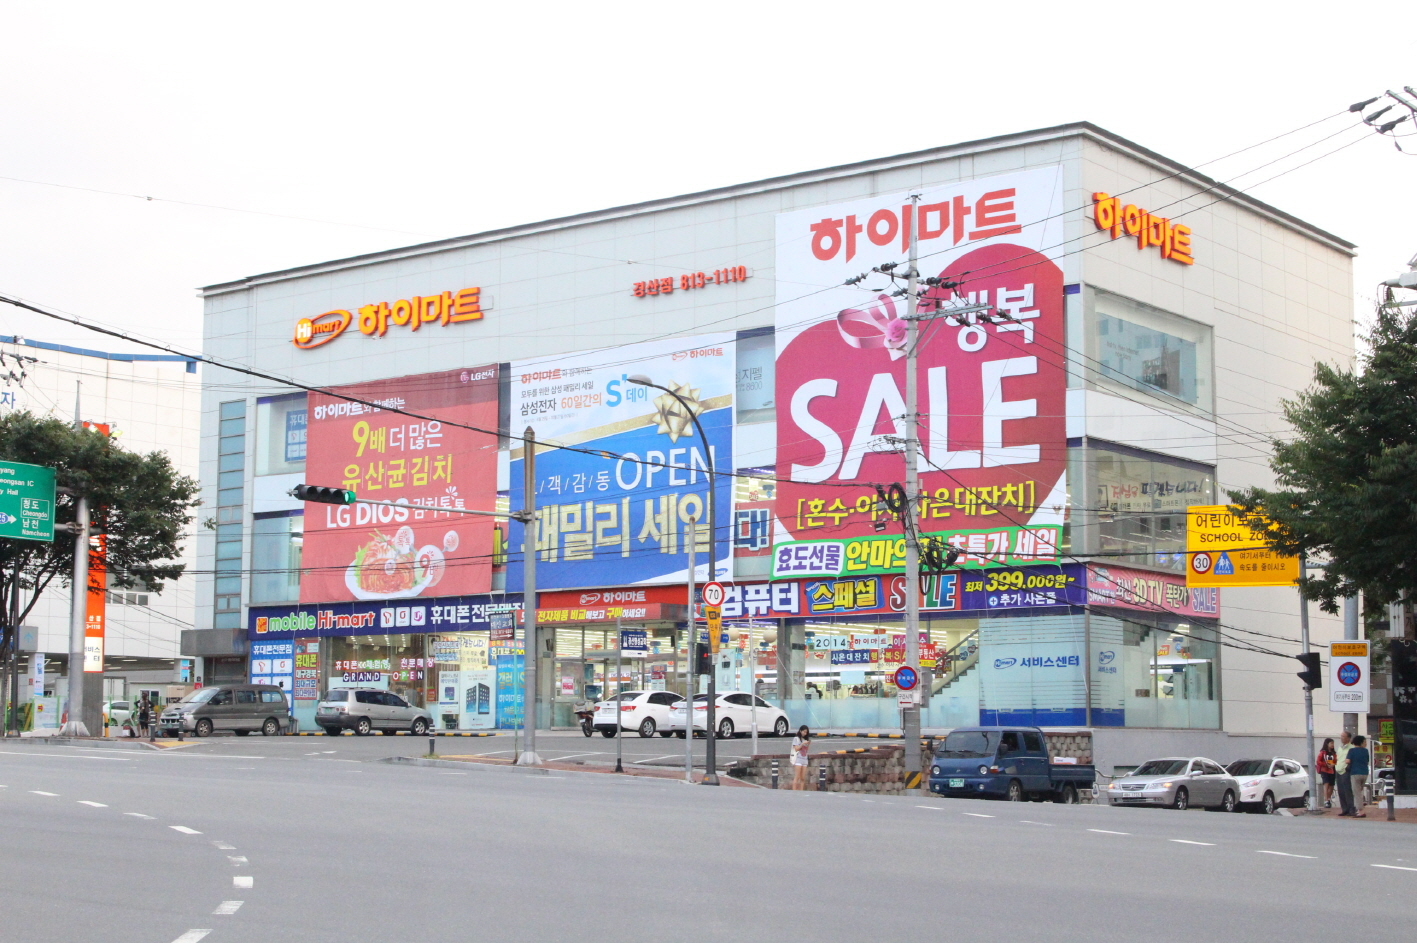 Lotte Hi-mart – Gyeongsan Branch (롯데 하이마트 (경산점))